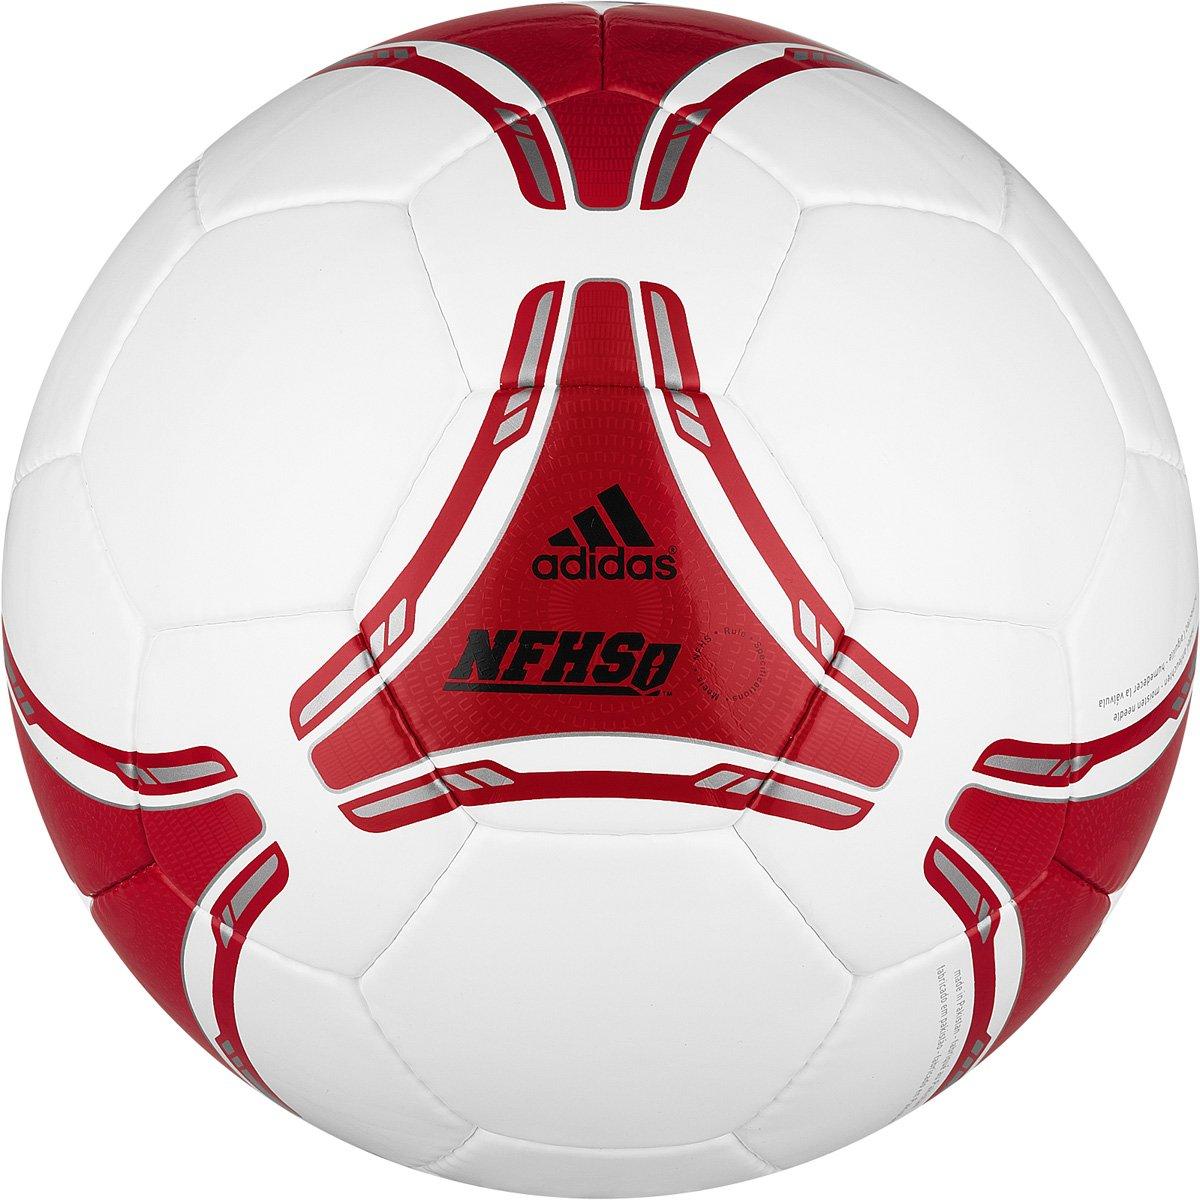 Adidas Fifa 2012 NFHSクラブボールホワイト、ライトスカーレット) B005AH7XGMSize 5